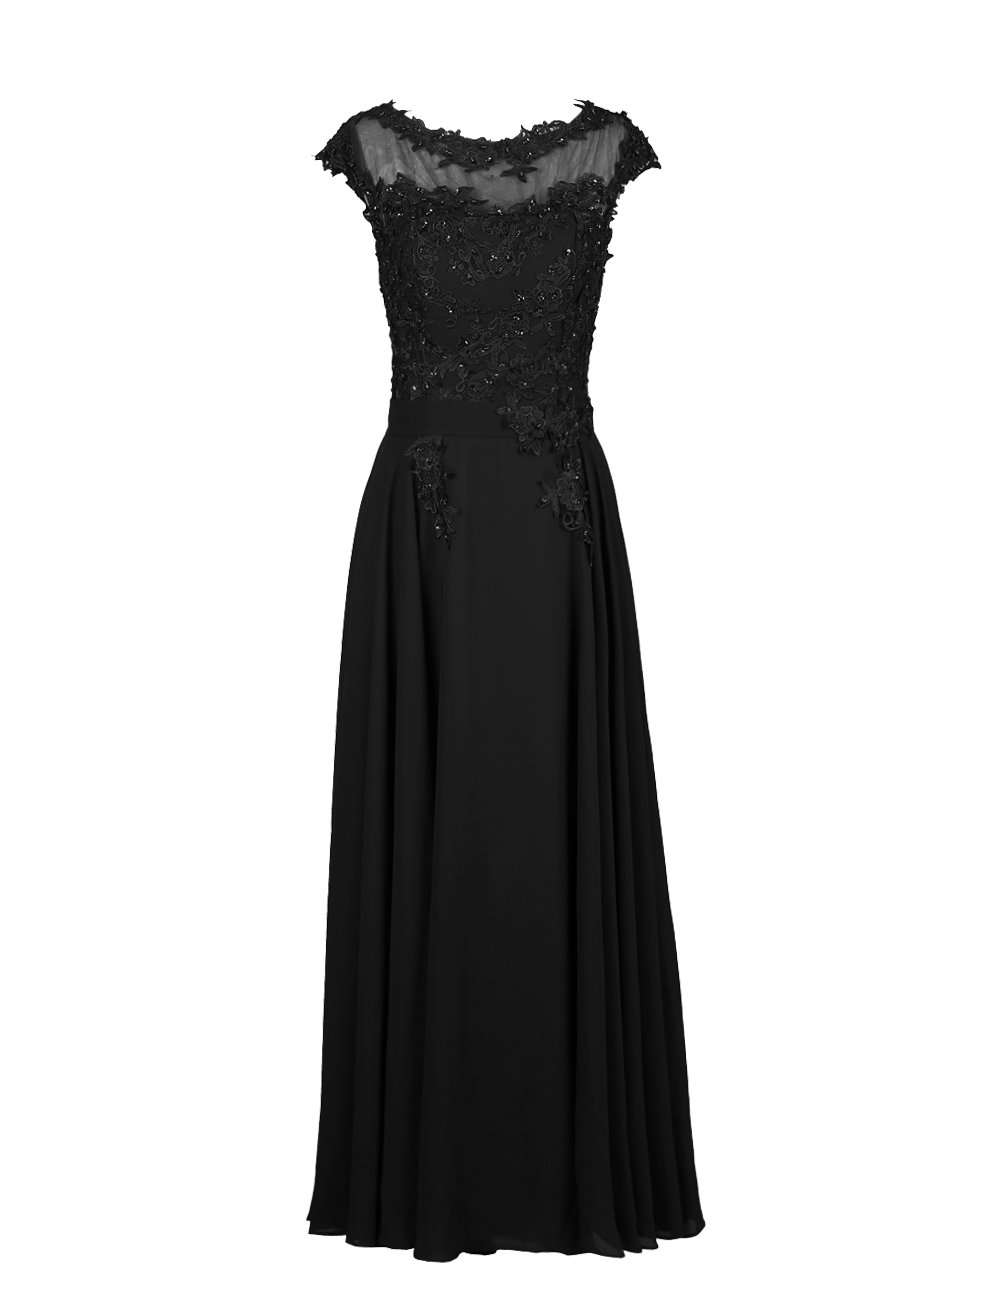 Dresstell(ドレステル) フォーマルドレス アップリケ付き ロング丈 レディーズ B00SFENS16 JP29W ブラック ブラック JP29W